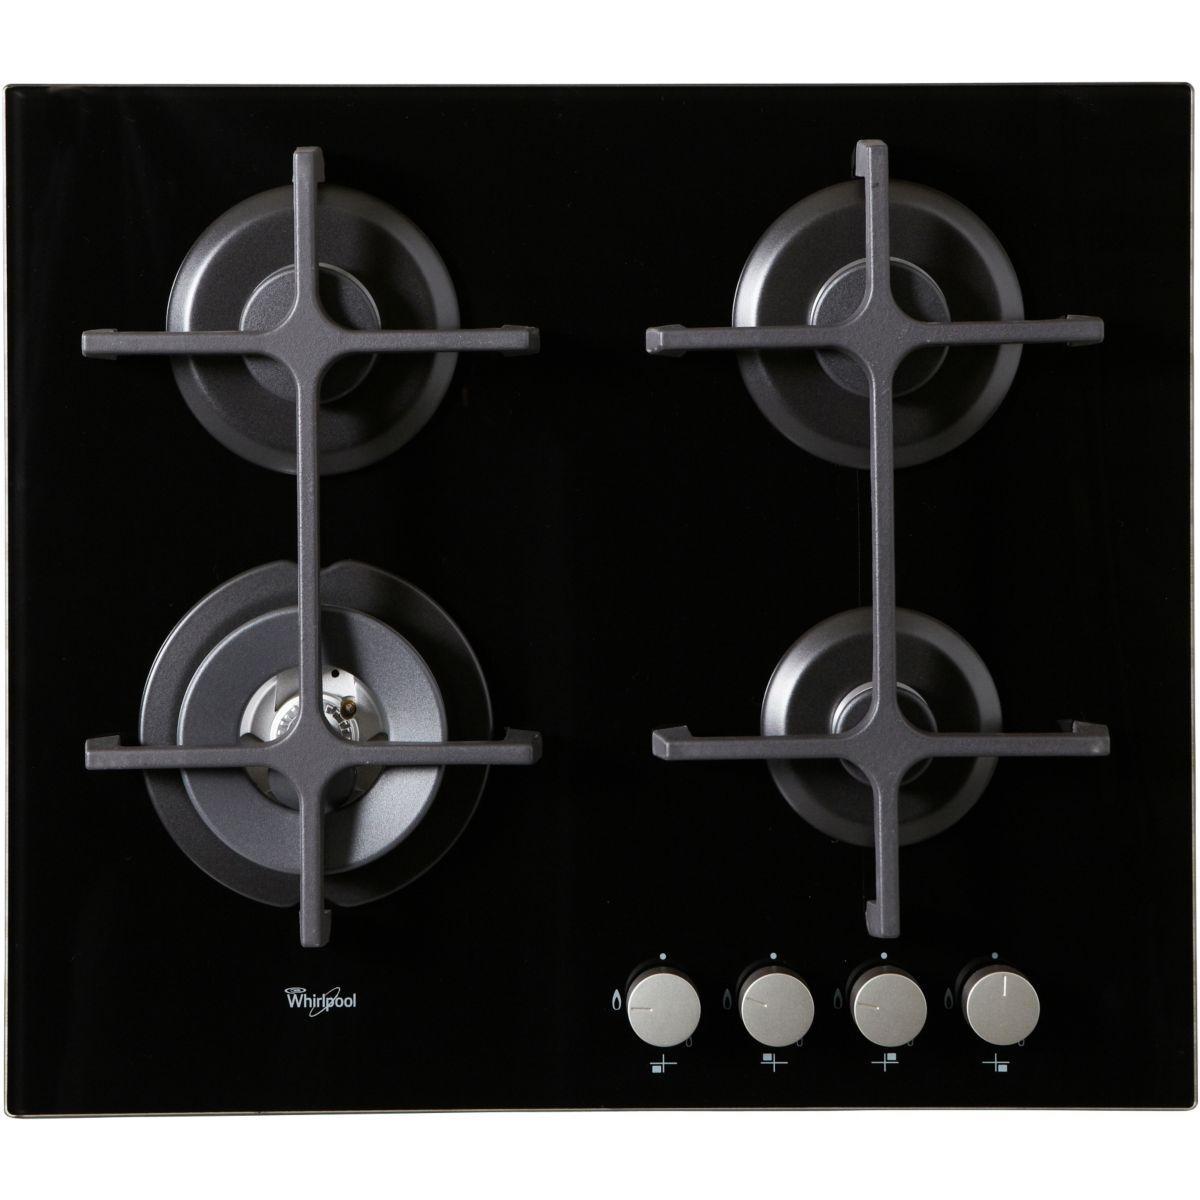 Table de cuisson gaz whirlpool akt7000nb - livraison offerte :...